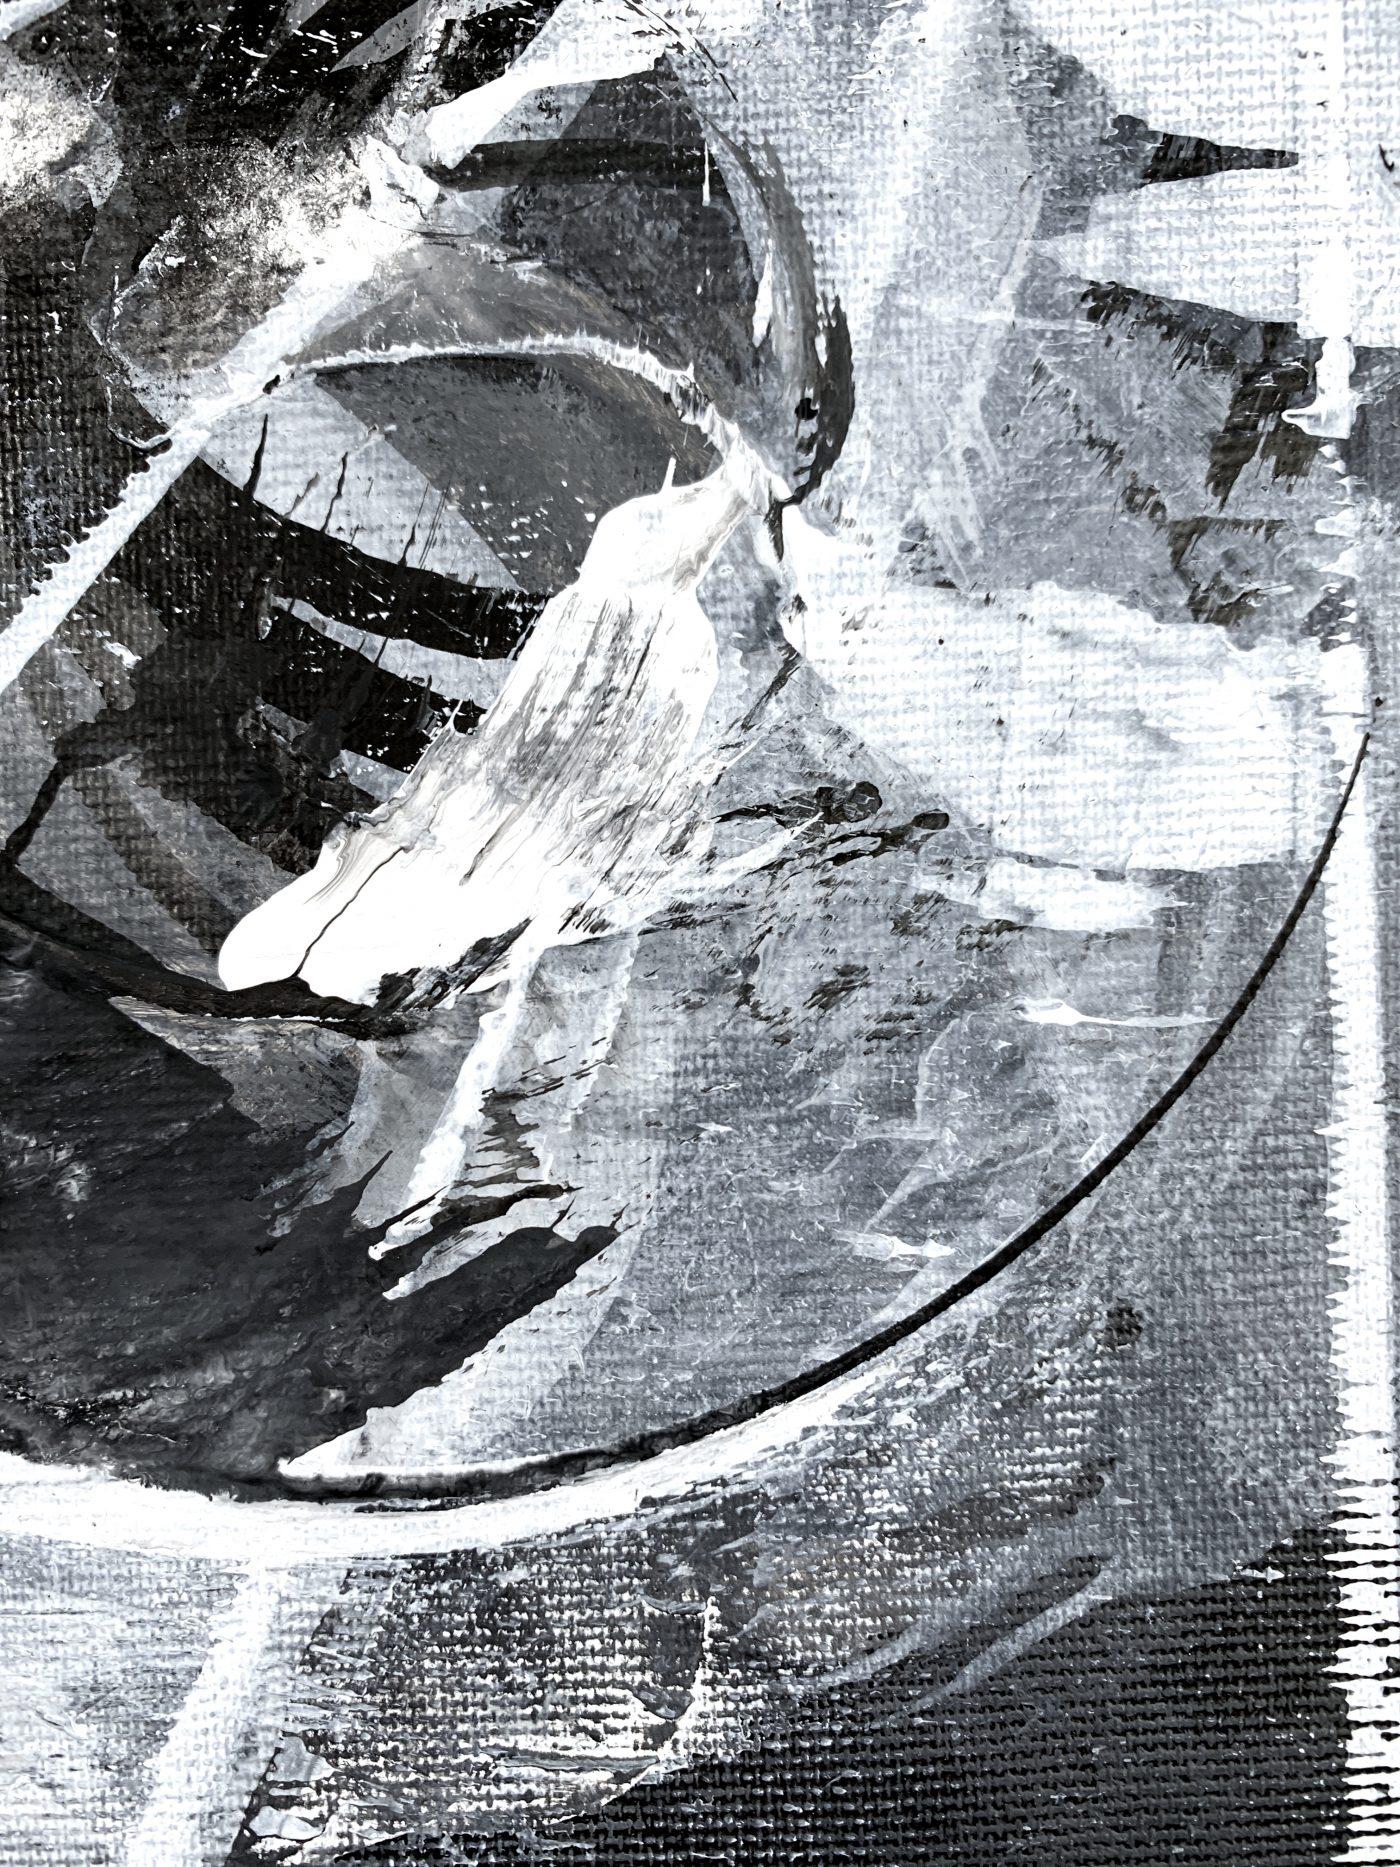 x423 - 26 Feb 2021 - Canvas